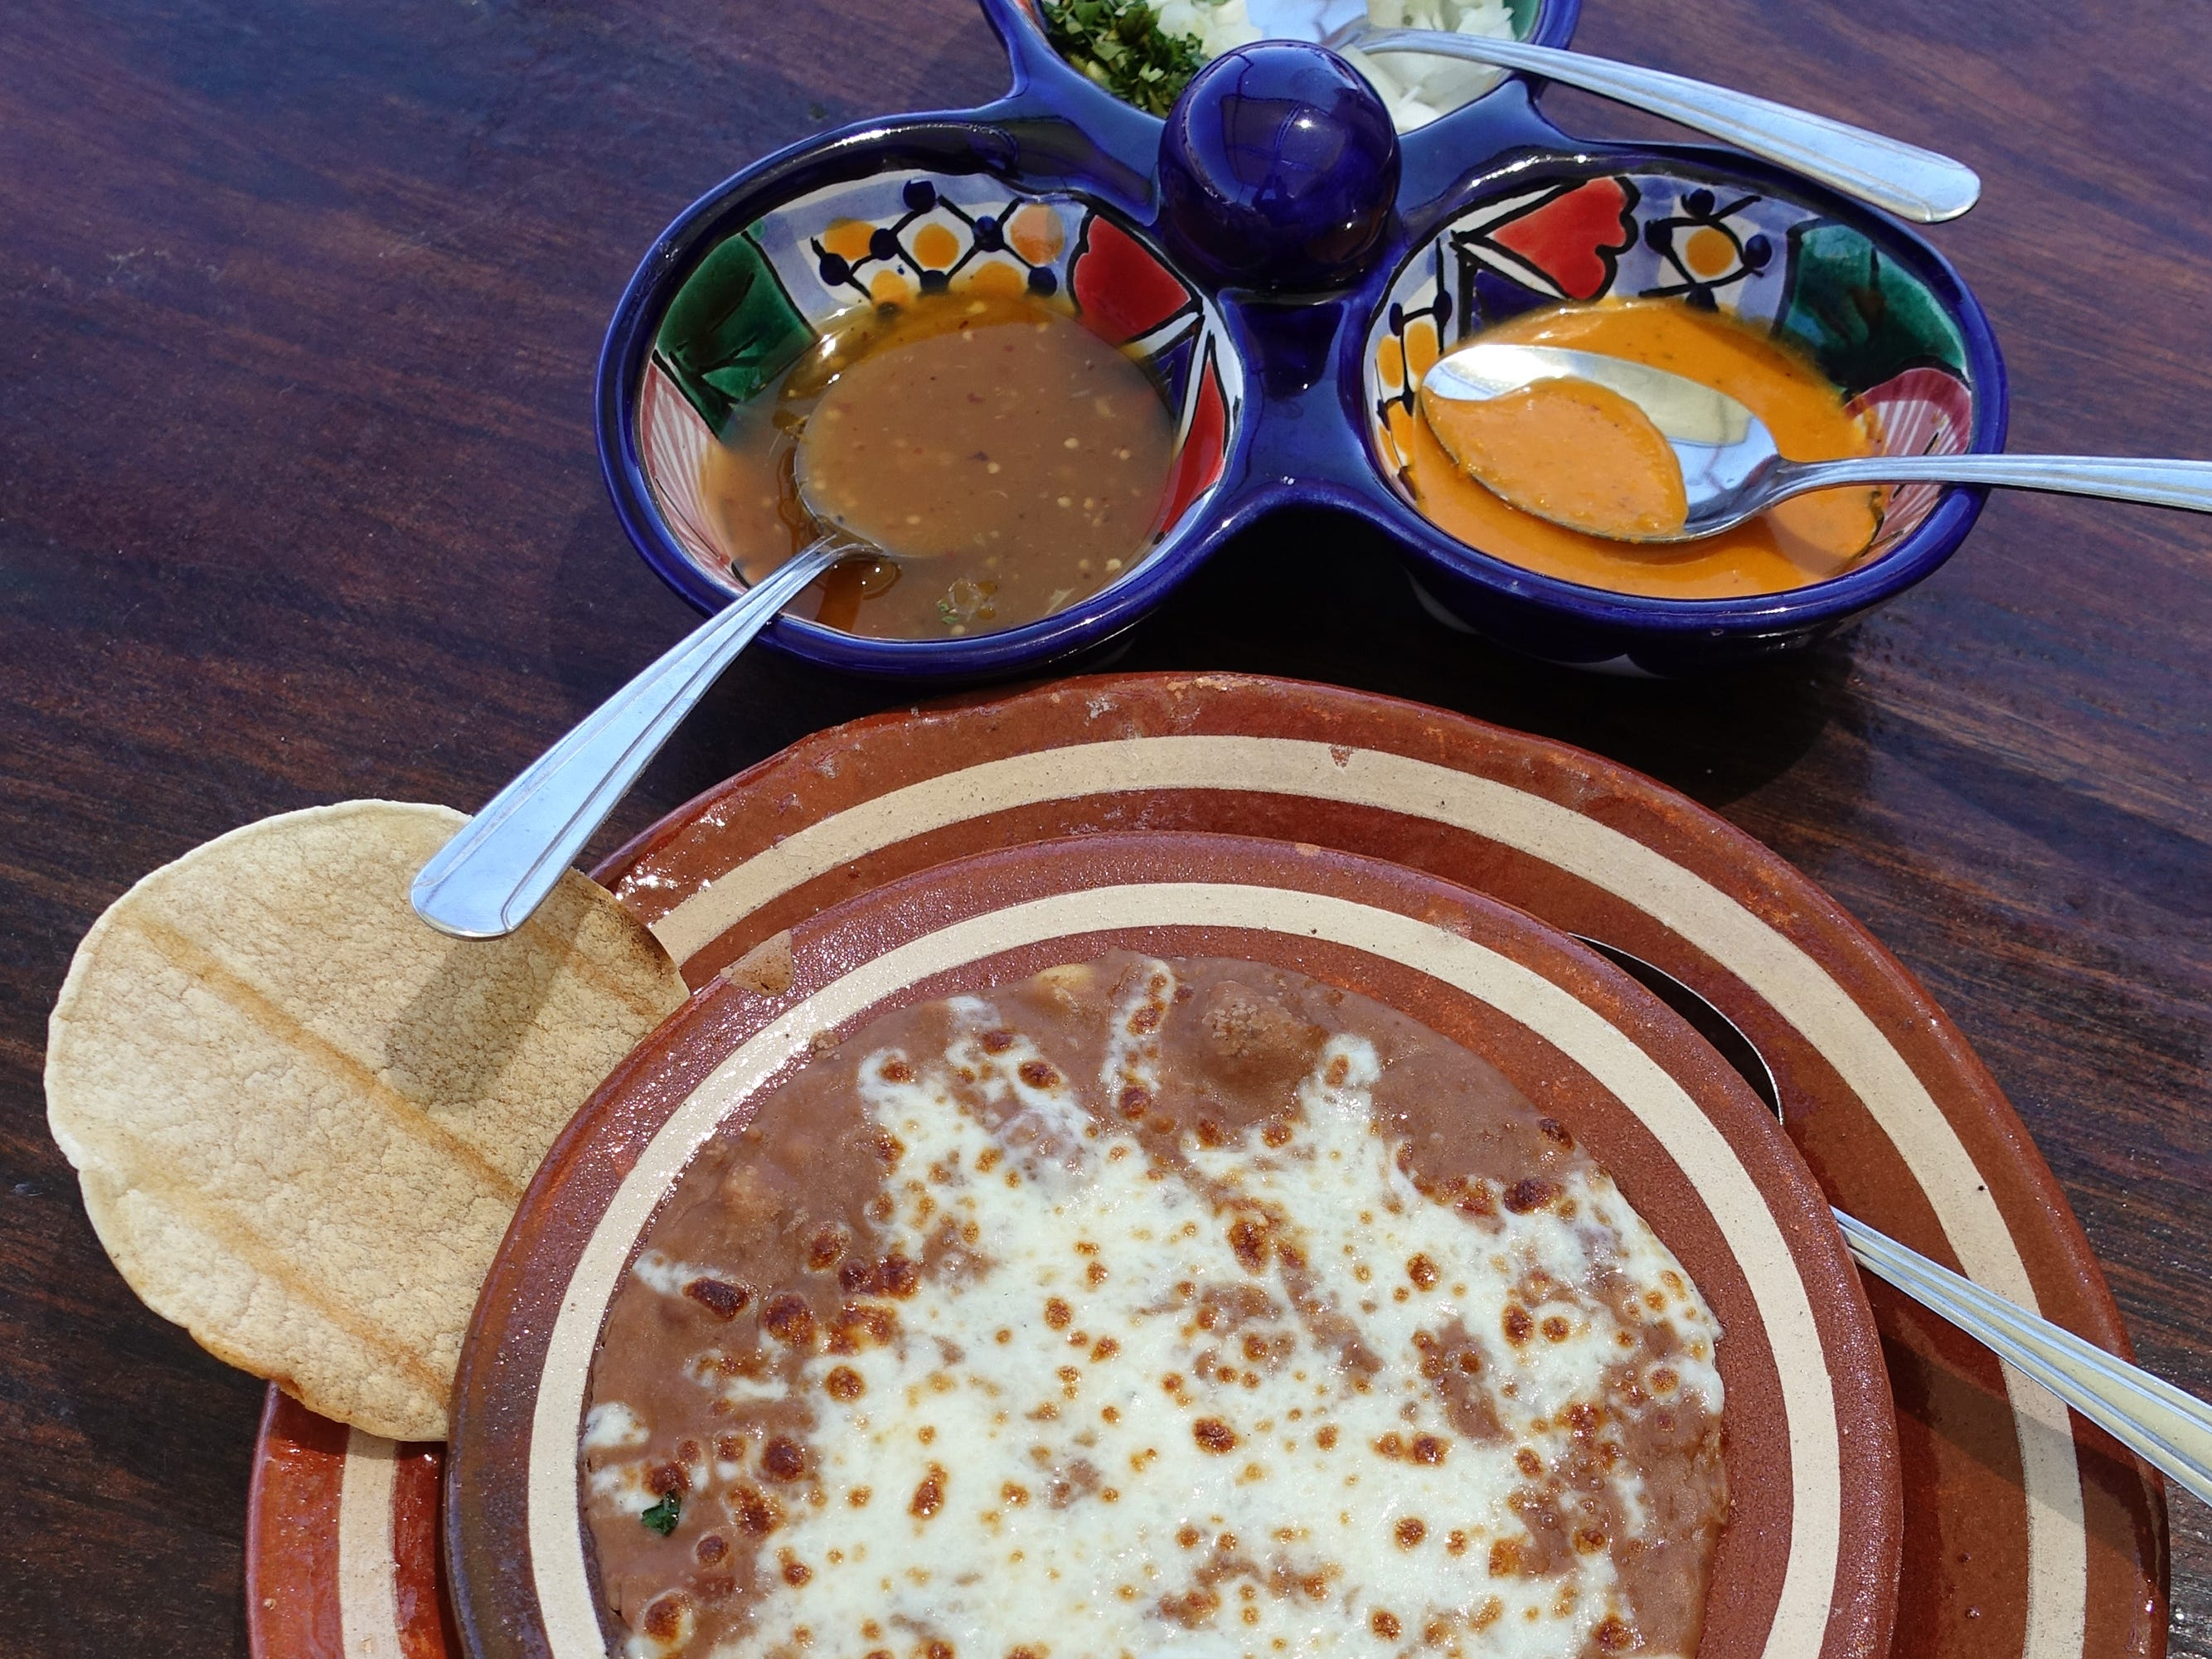 Frijoles refritos, tostaditas and salsa at La Marquesa in Phoenix.